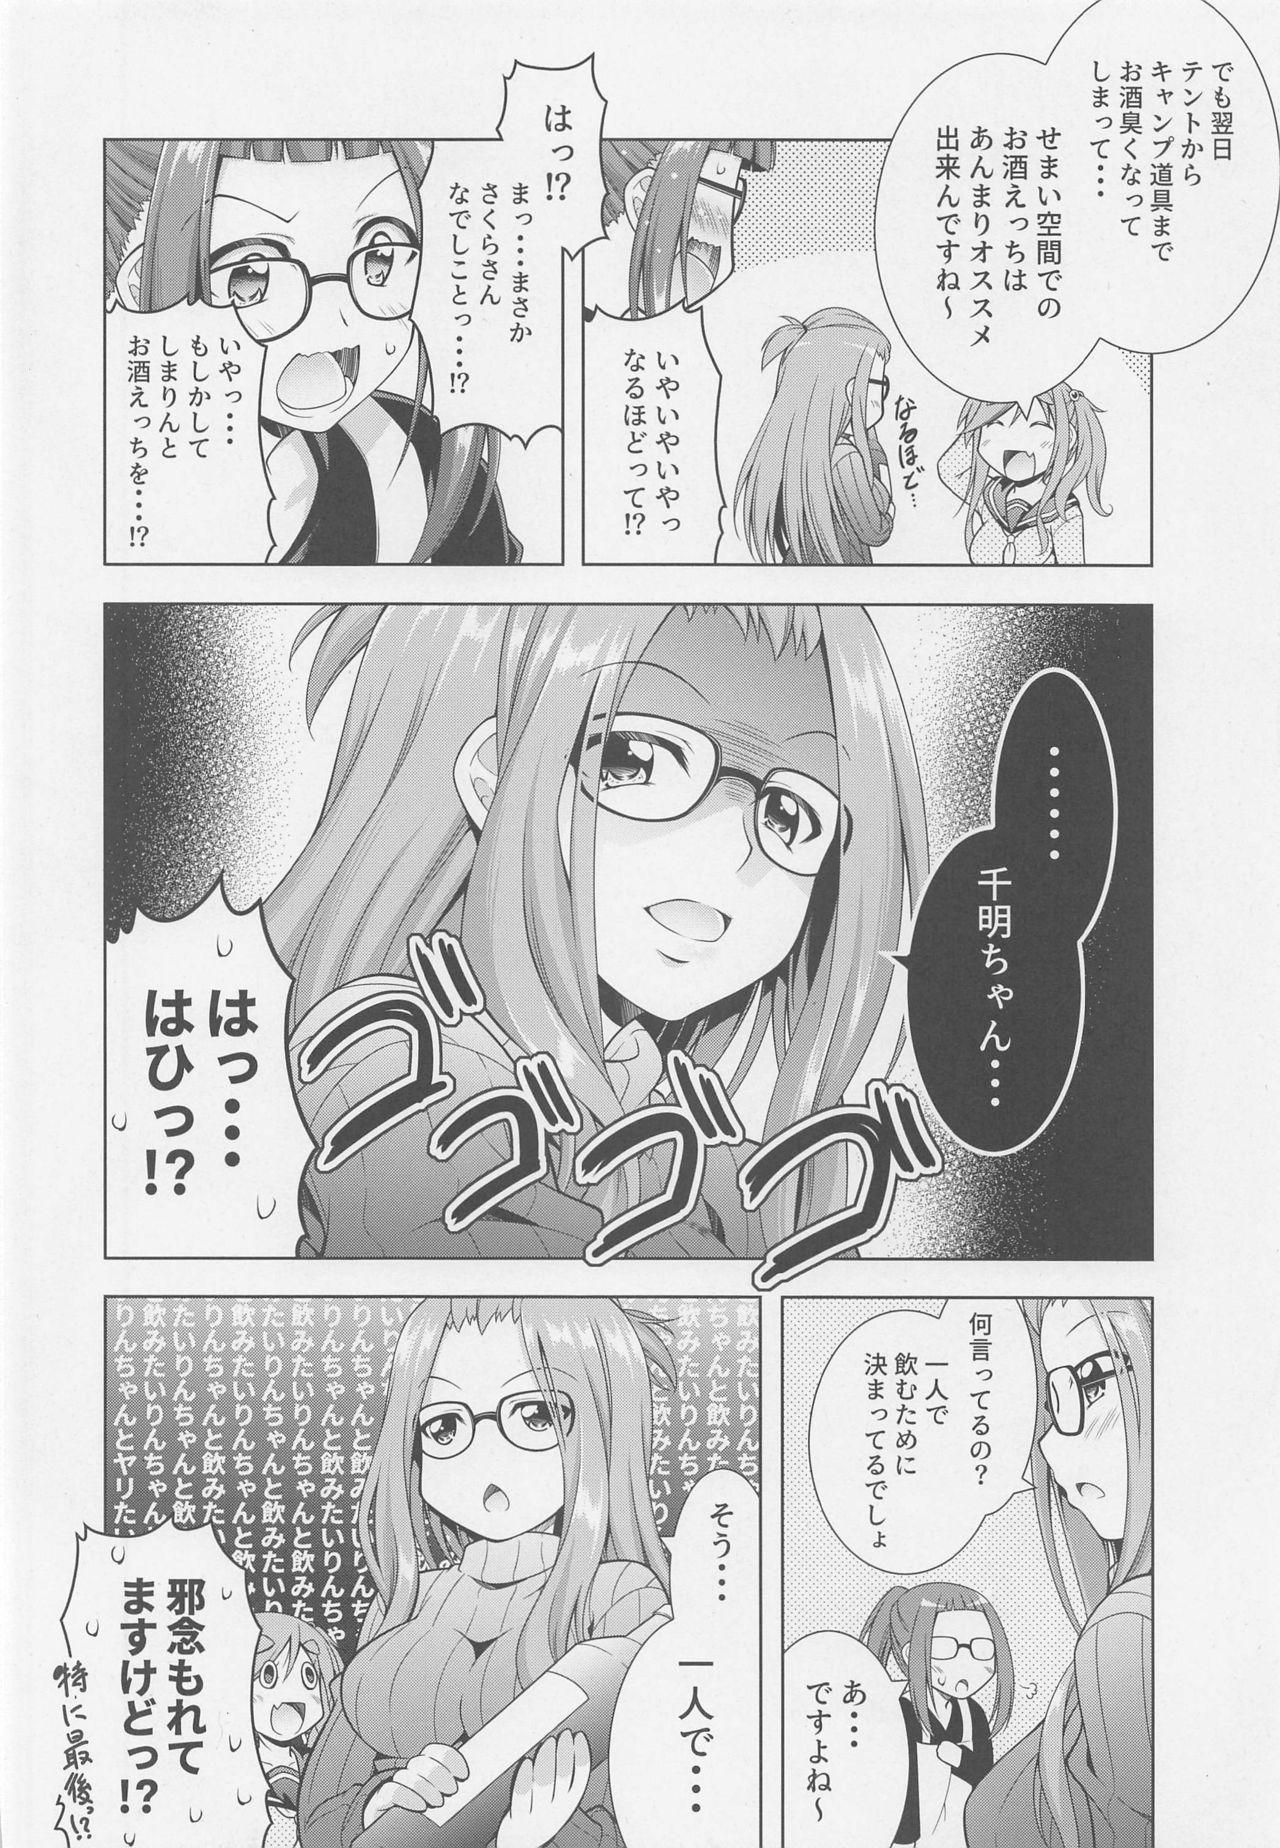 Inuyama Aoi-chan to Osake de Icha Camp 15